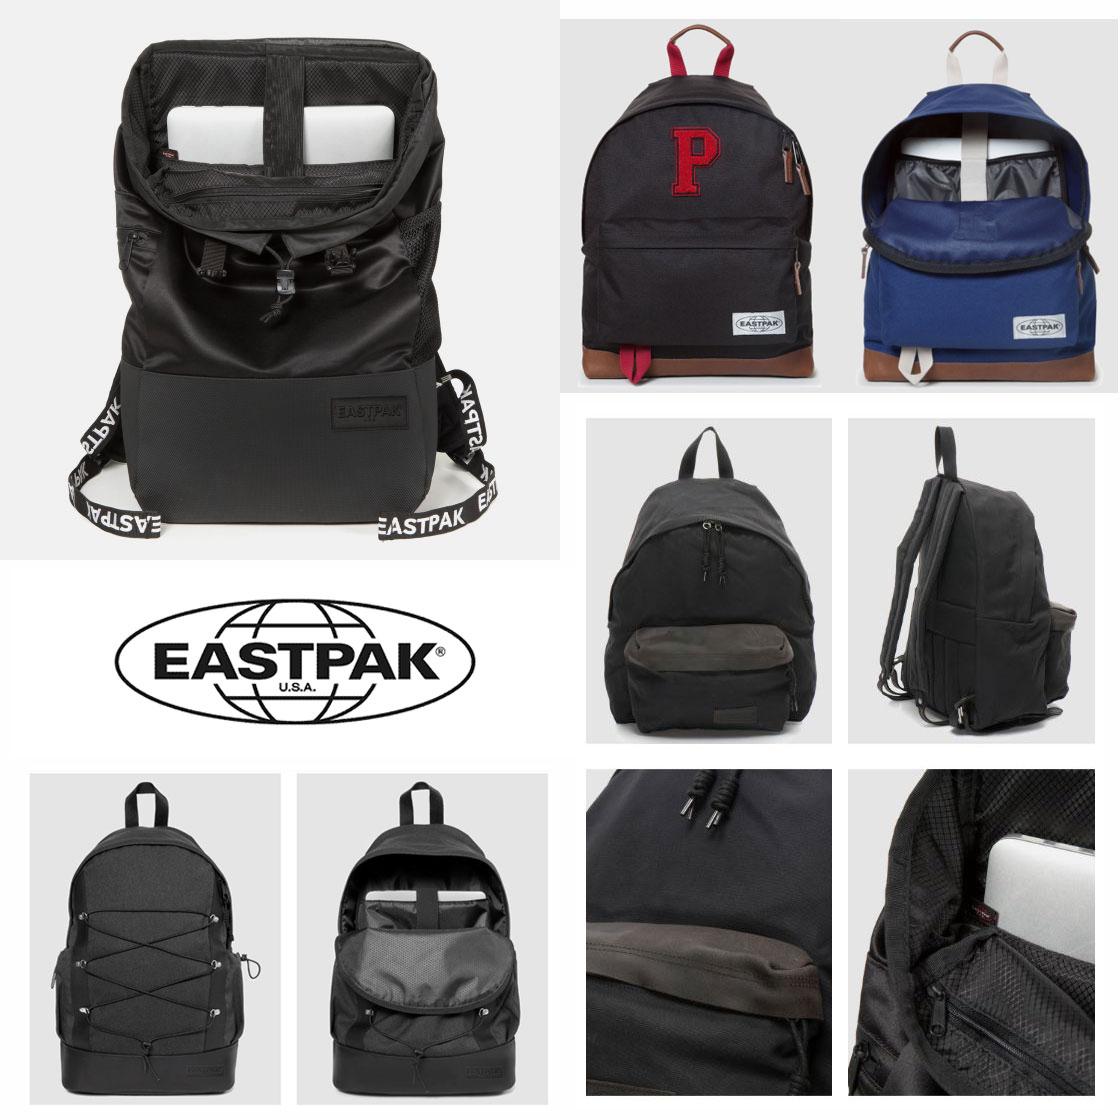 Eastpak rugtassen -70% korting - va €24,99 @ Masion Lab